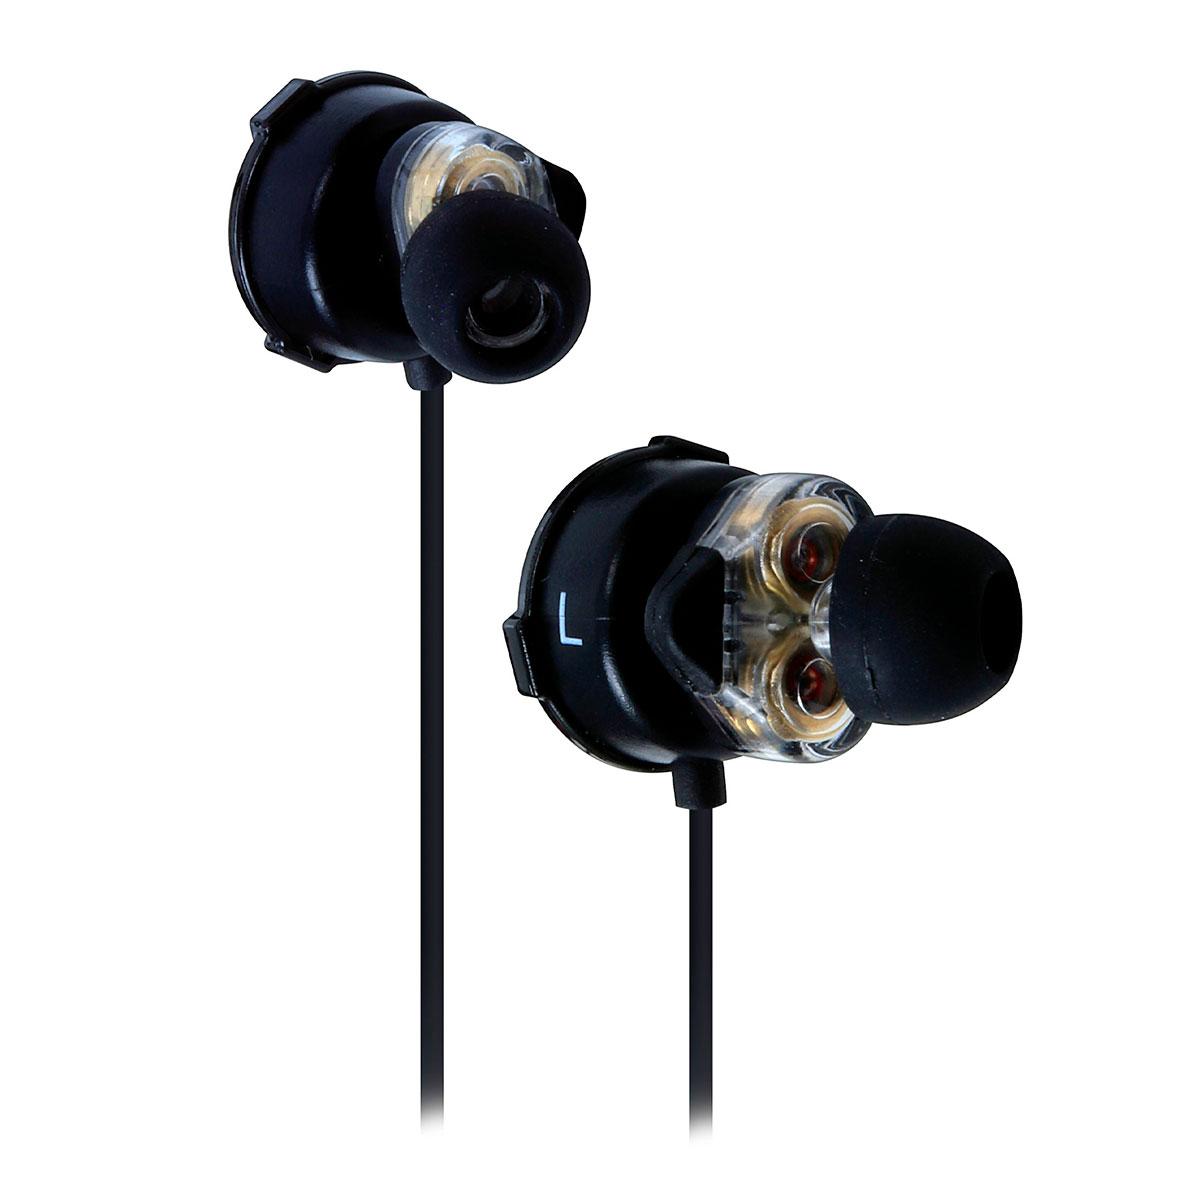 Fone de Ouvido Gamer OEX Quad Plus FN501, P3 de 3.5mm em 90°, 4 Drivers de Audio, Mic Removivel